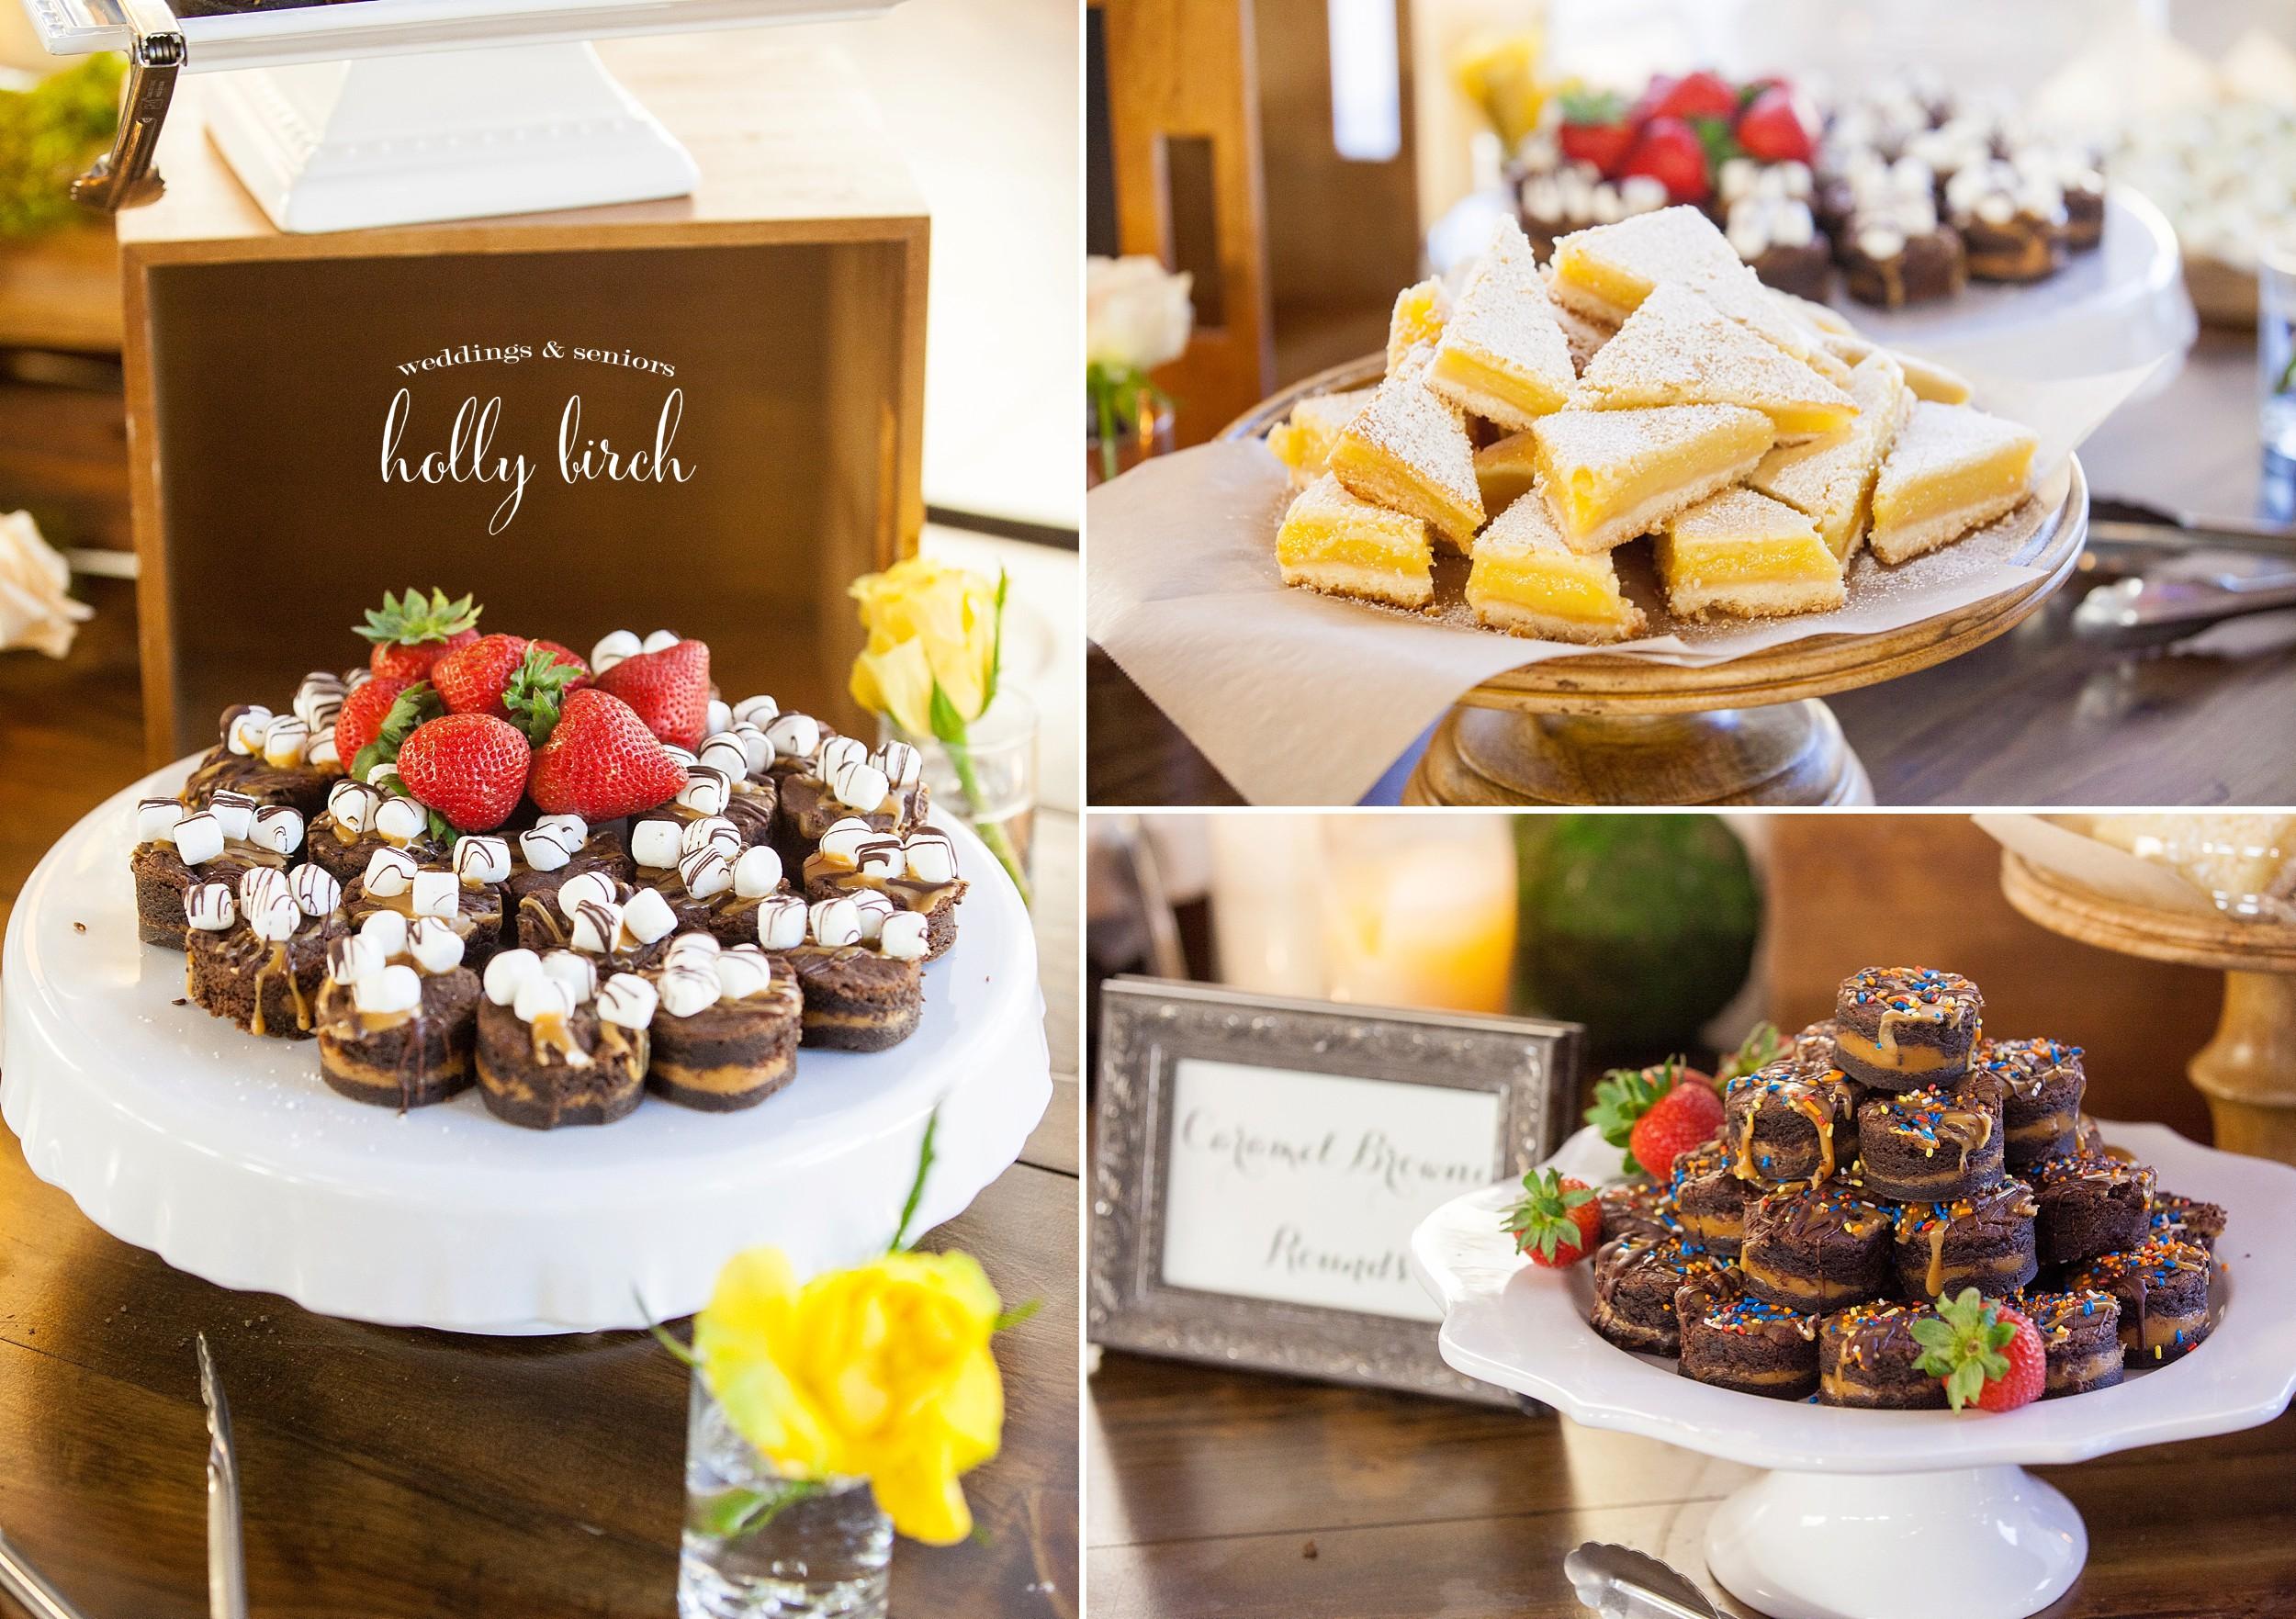 Pear Tree Estate desserts